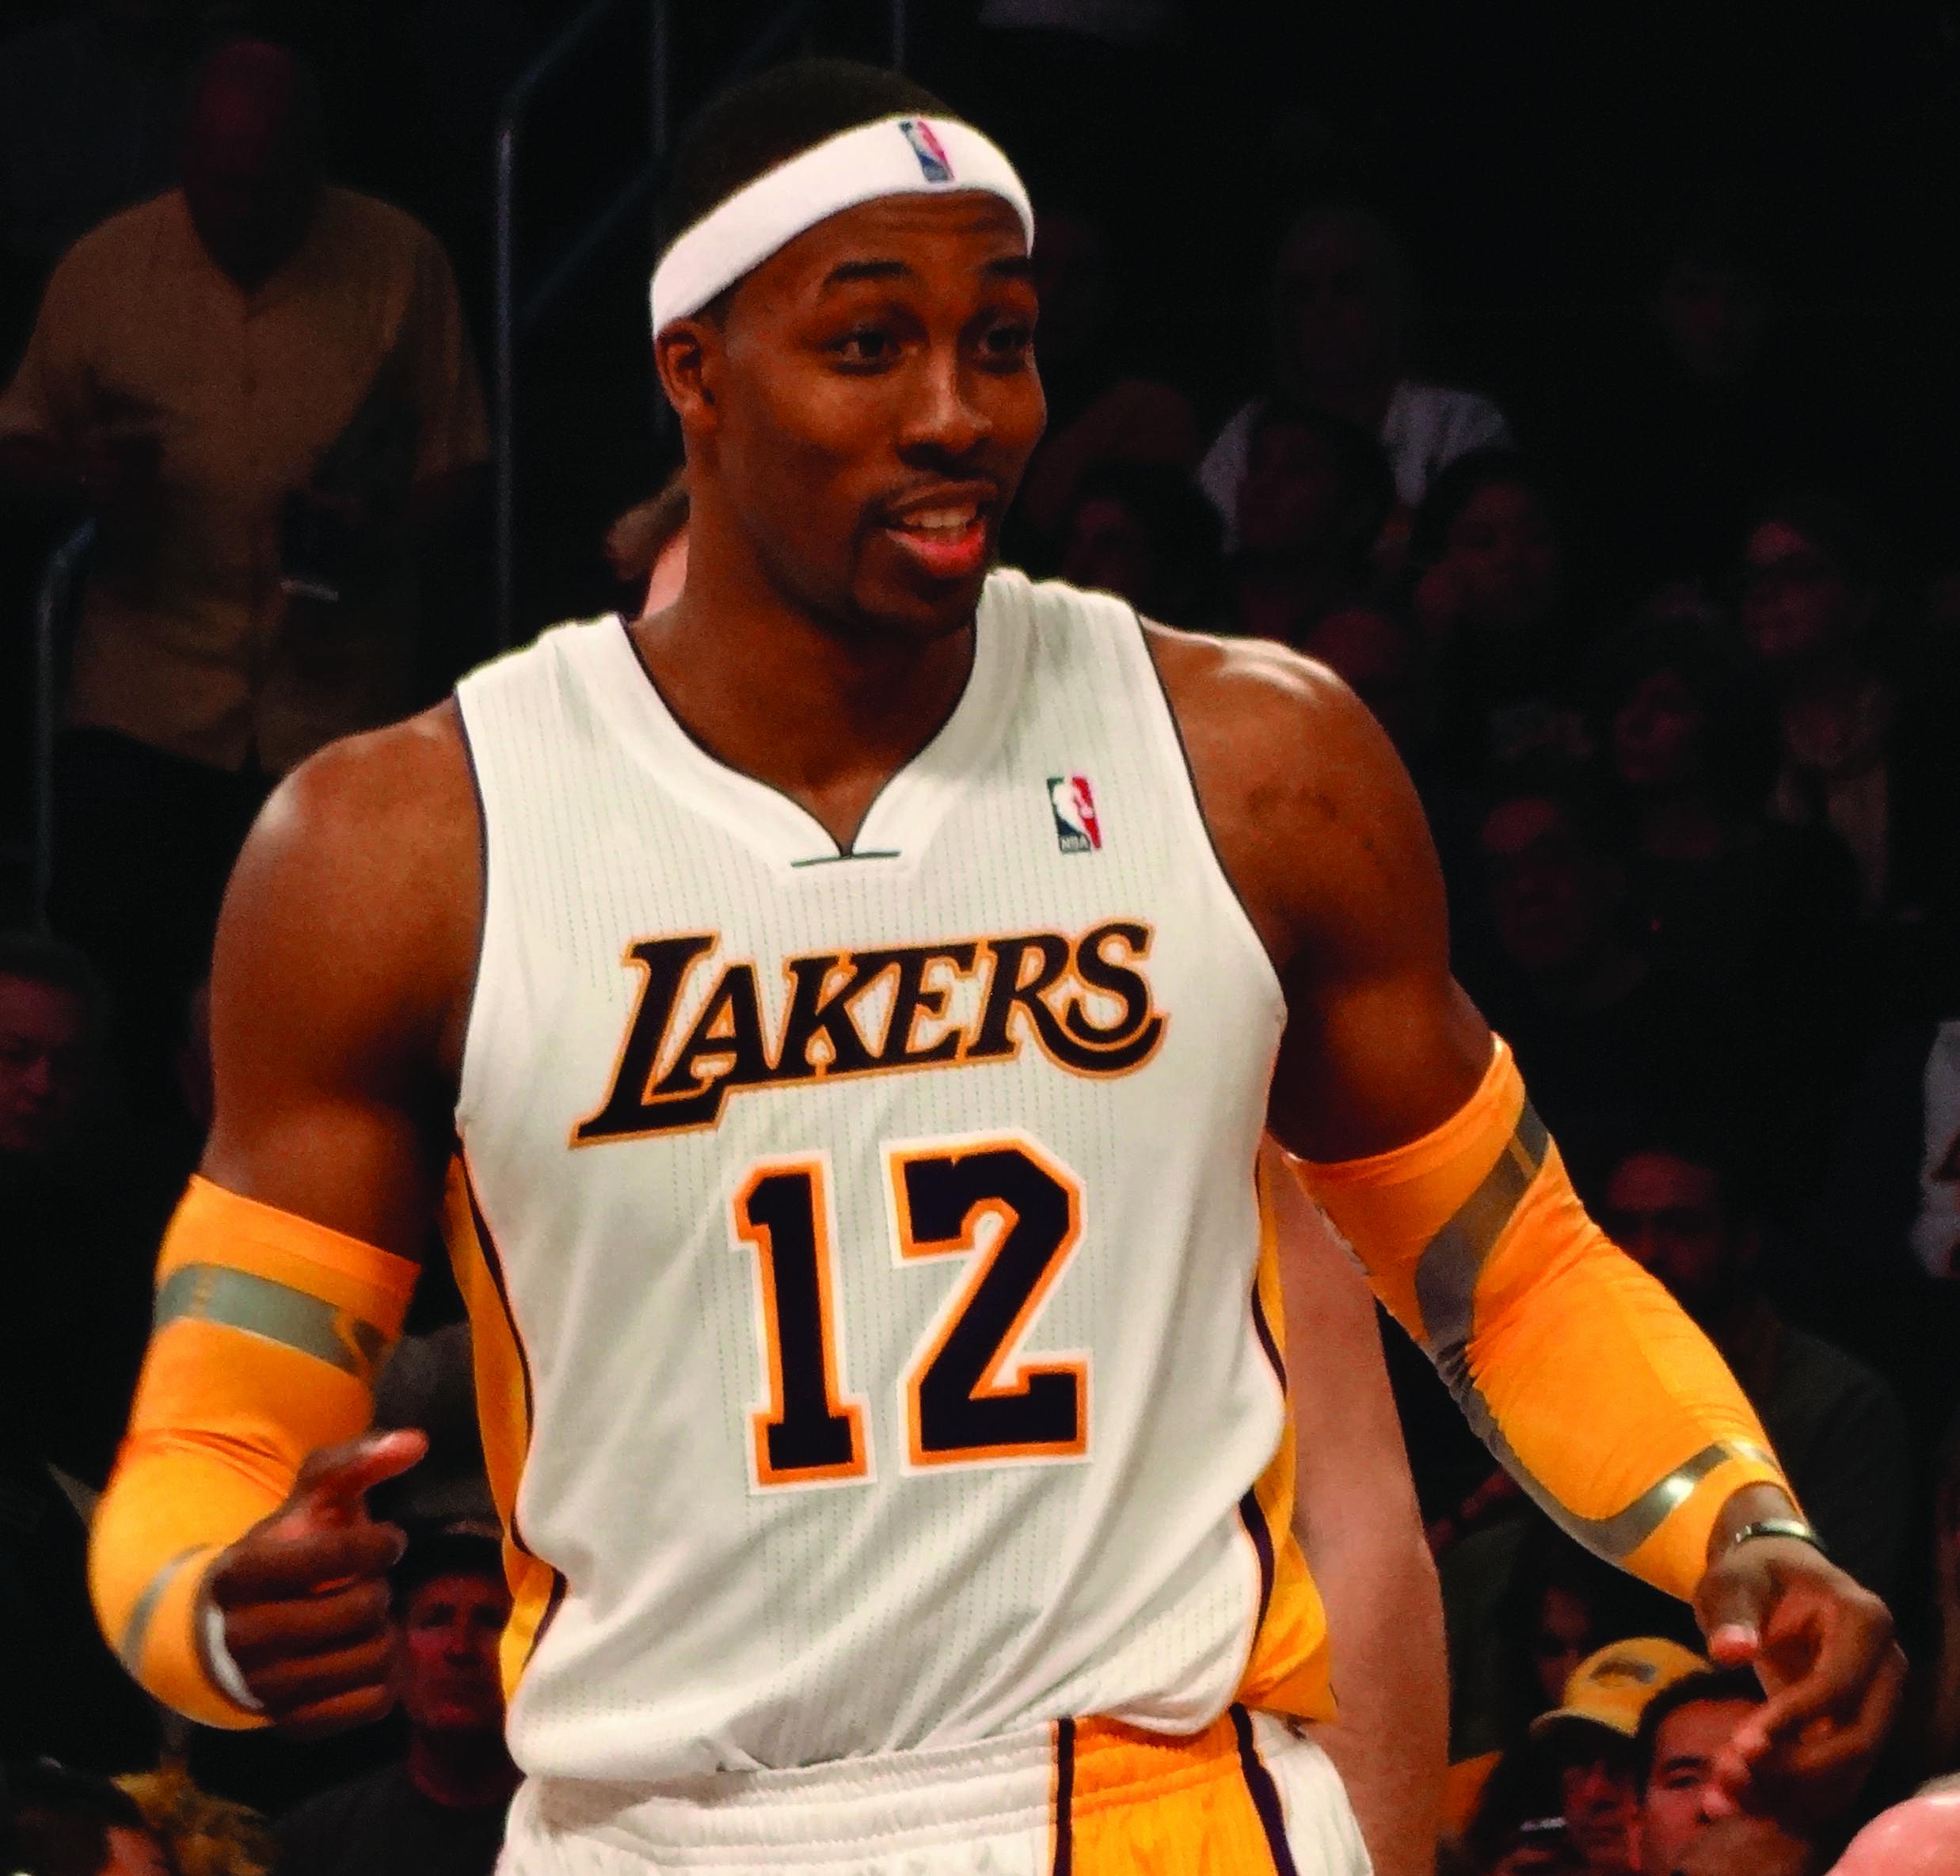 The NBA's easiest punching bag seeks redemption